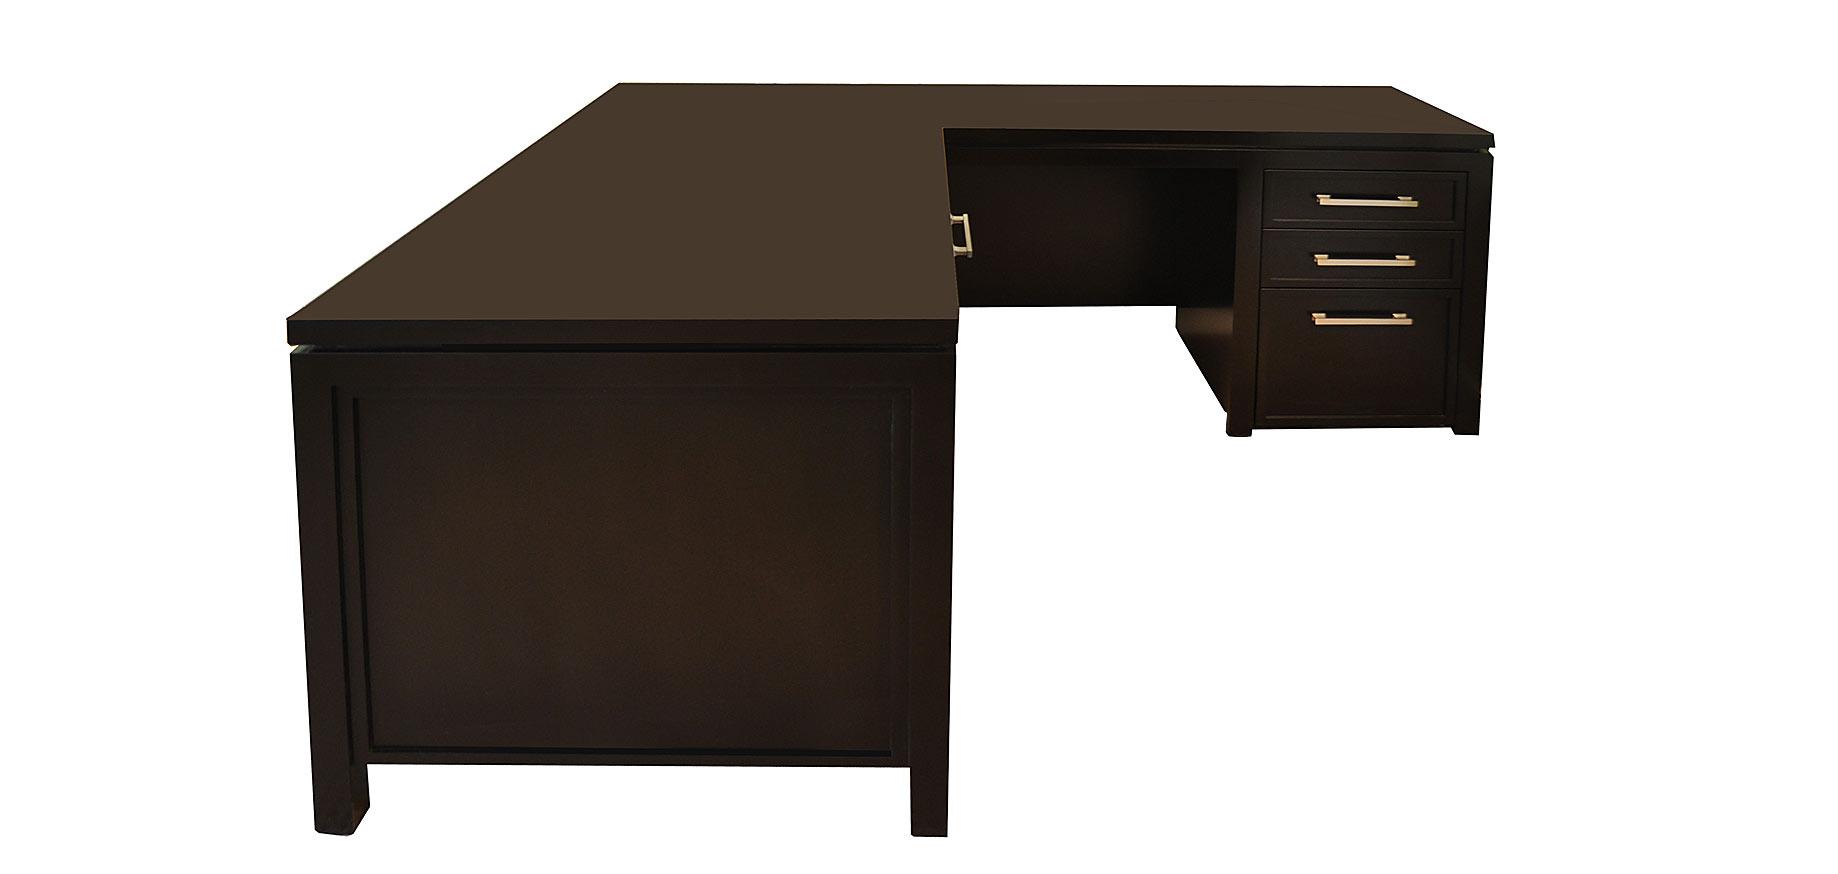 Ming Sectional Desk